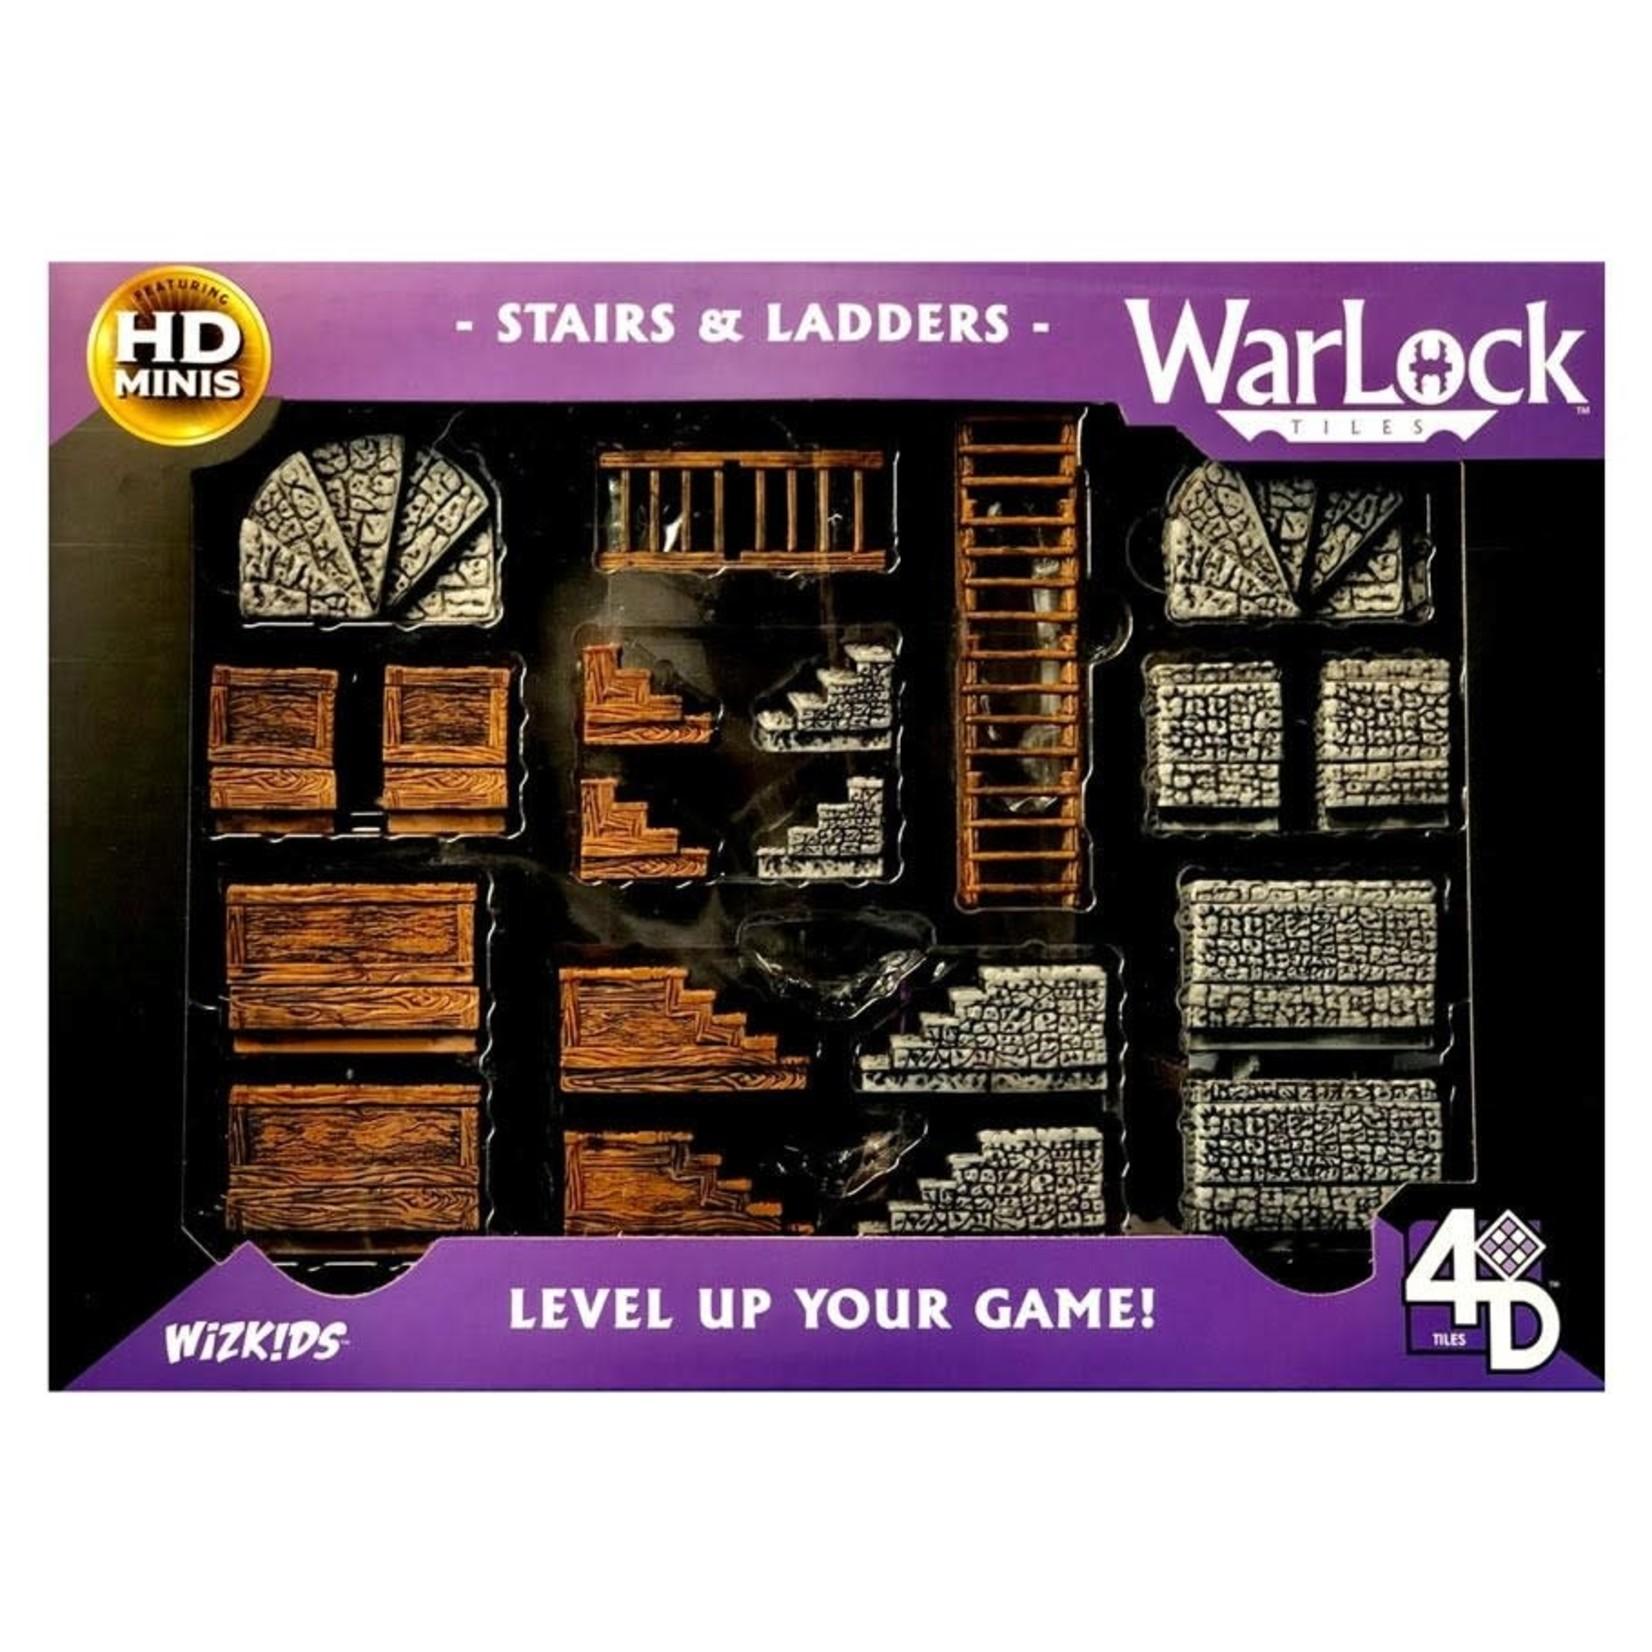 WizKids Wizkids D&D WarLock Tiles: Stairs and Ladders